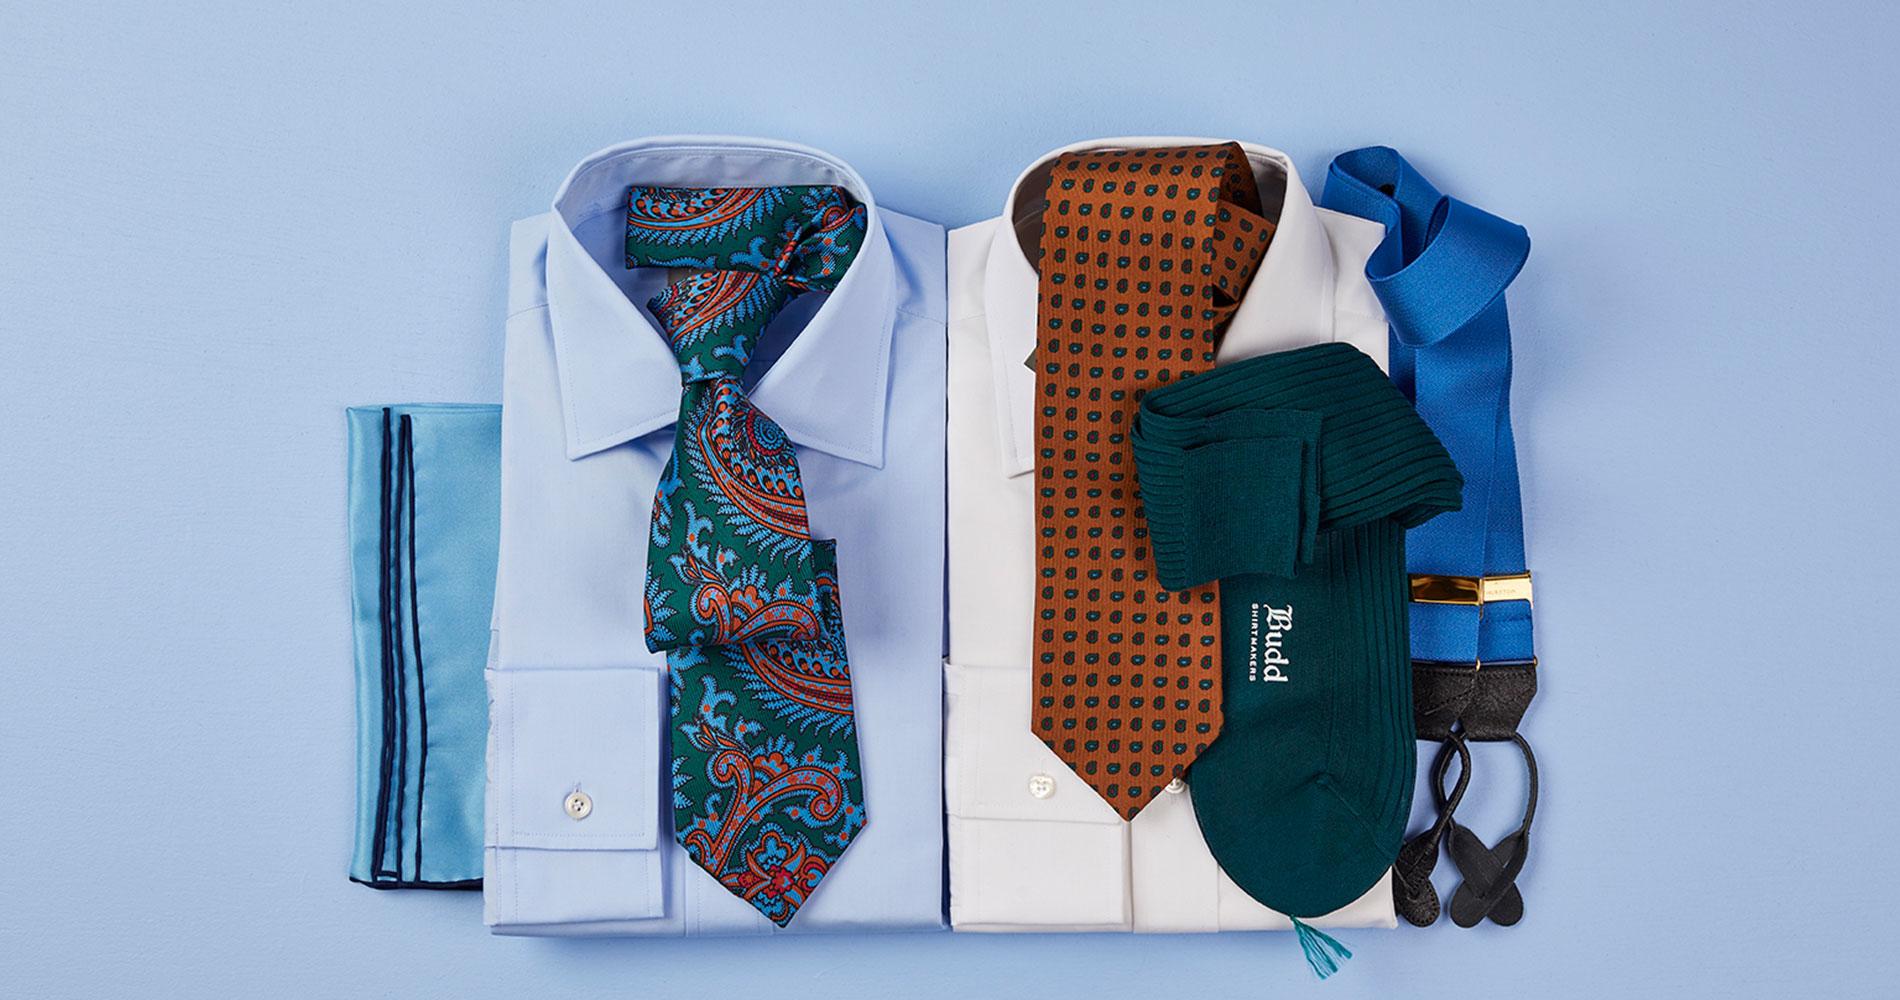 Budd Cotton Poplin Shirt with Silk pocket squares, ties and braces